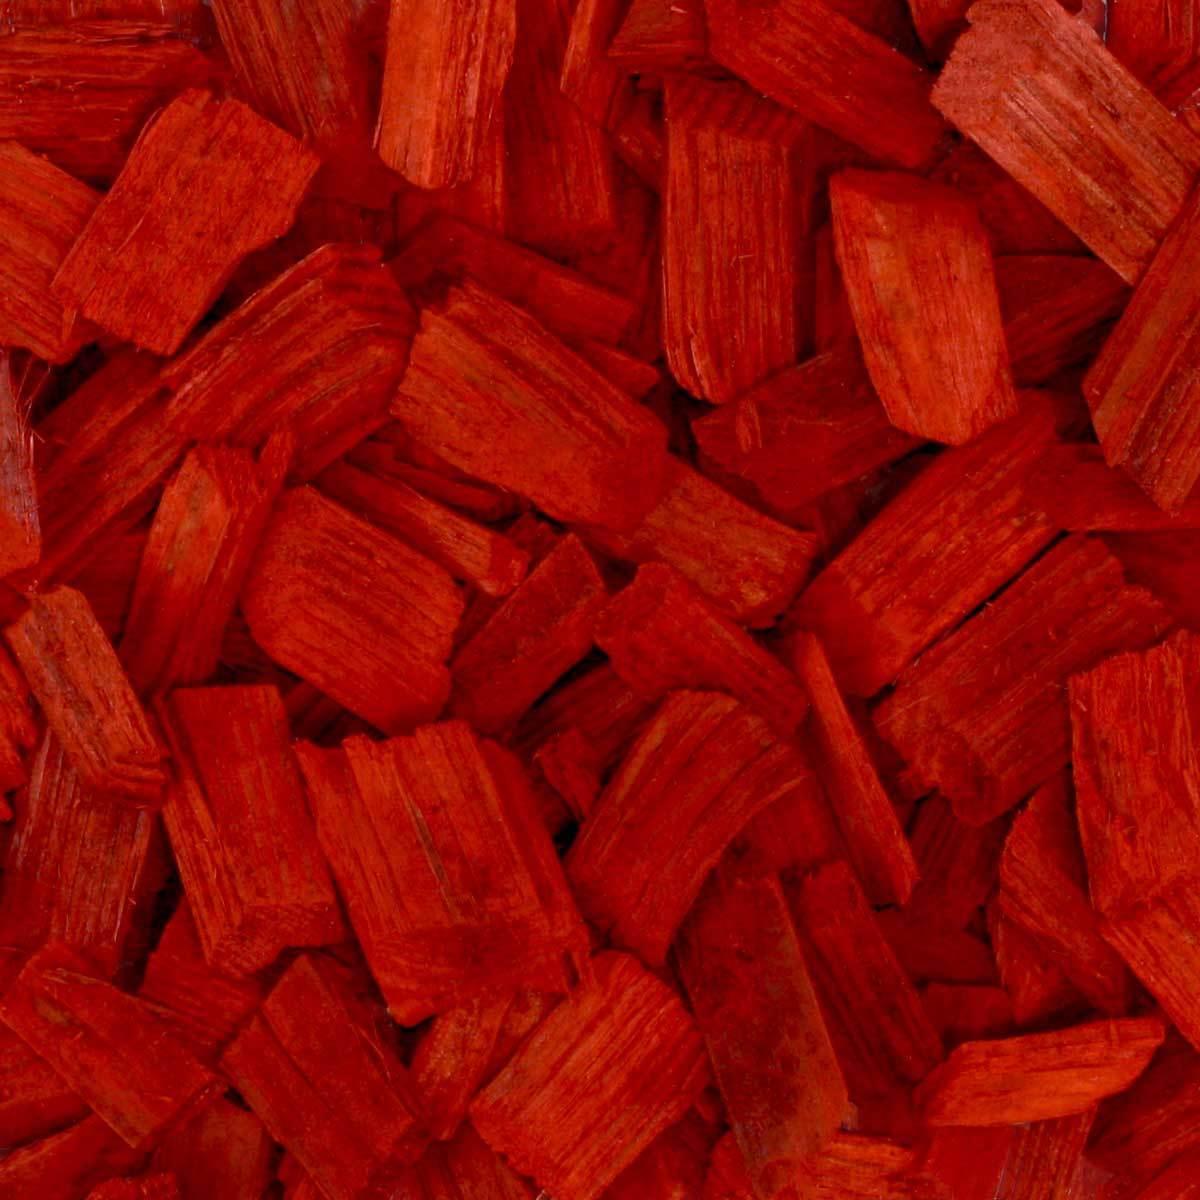 Holzhackschnitzel Rot Hackschnitzel Deko Holz Hackgut 70l x 12 Sack 840l Palette